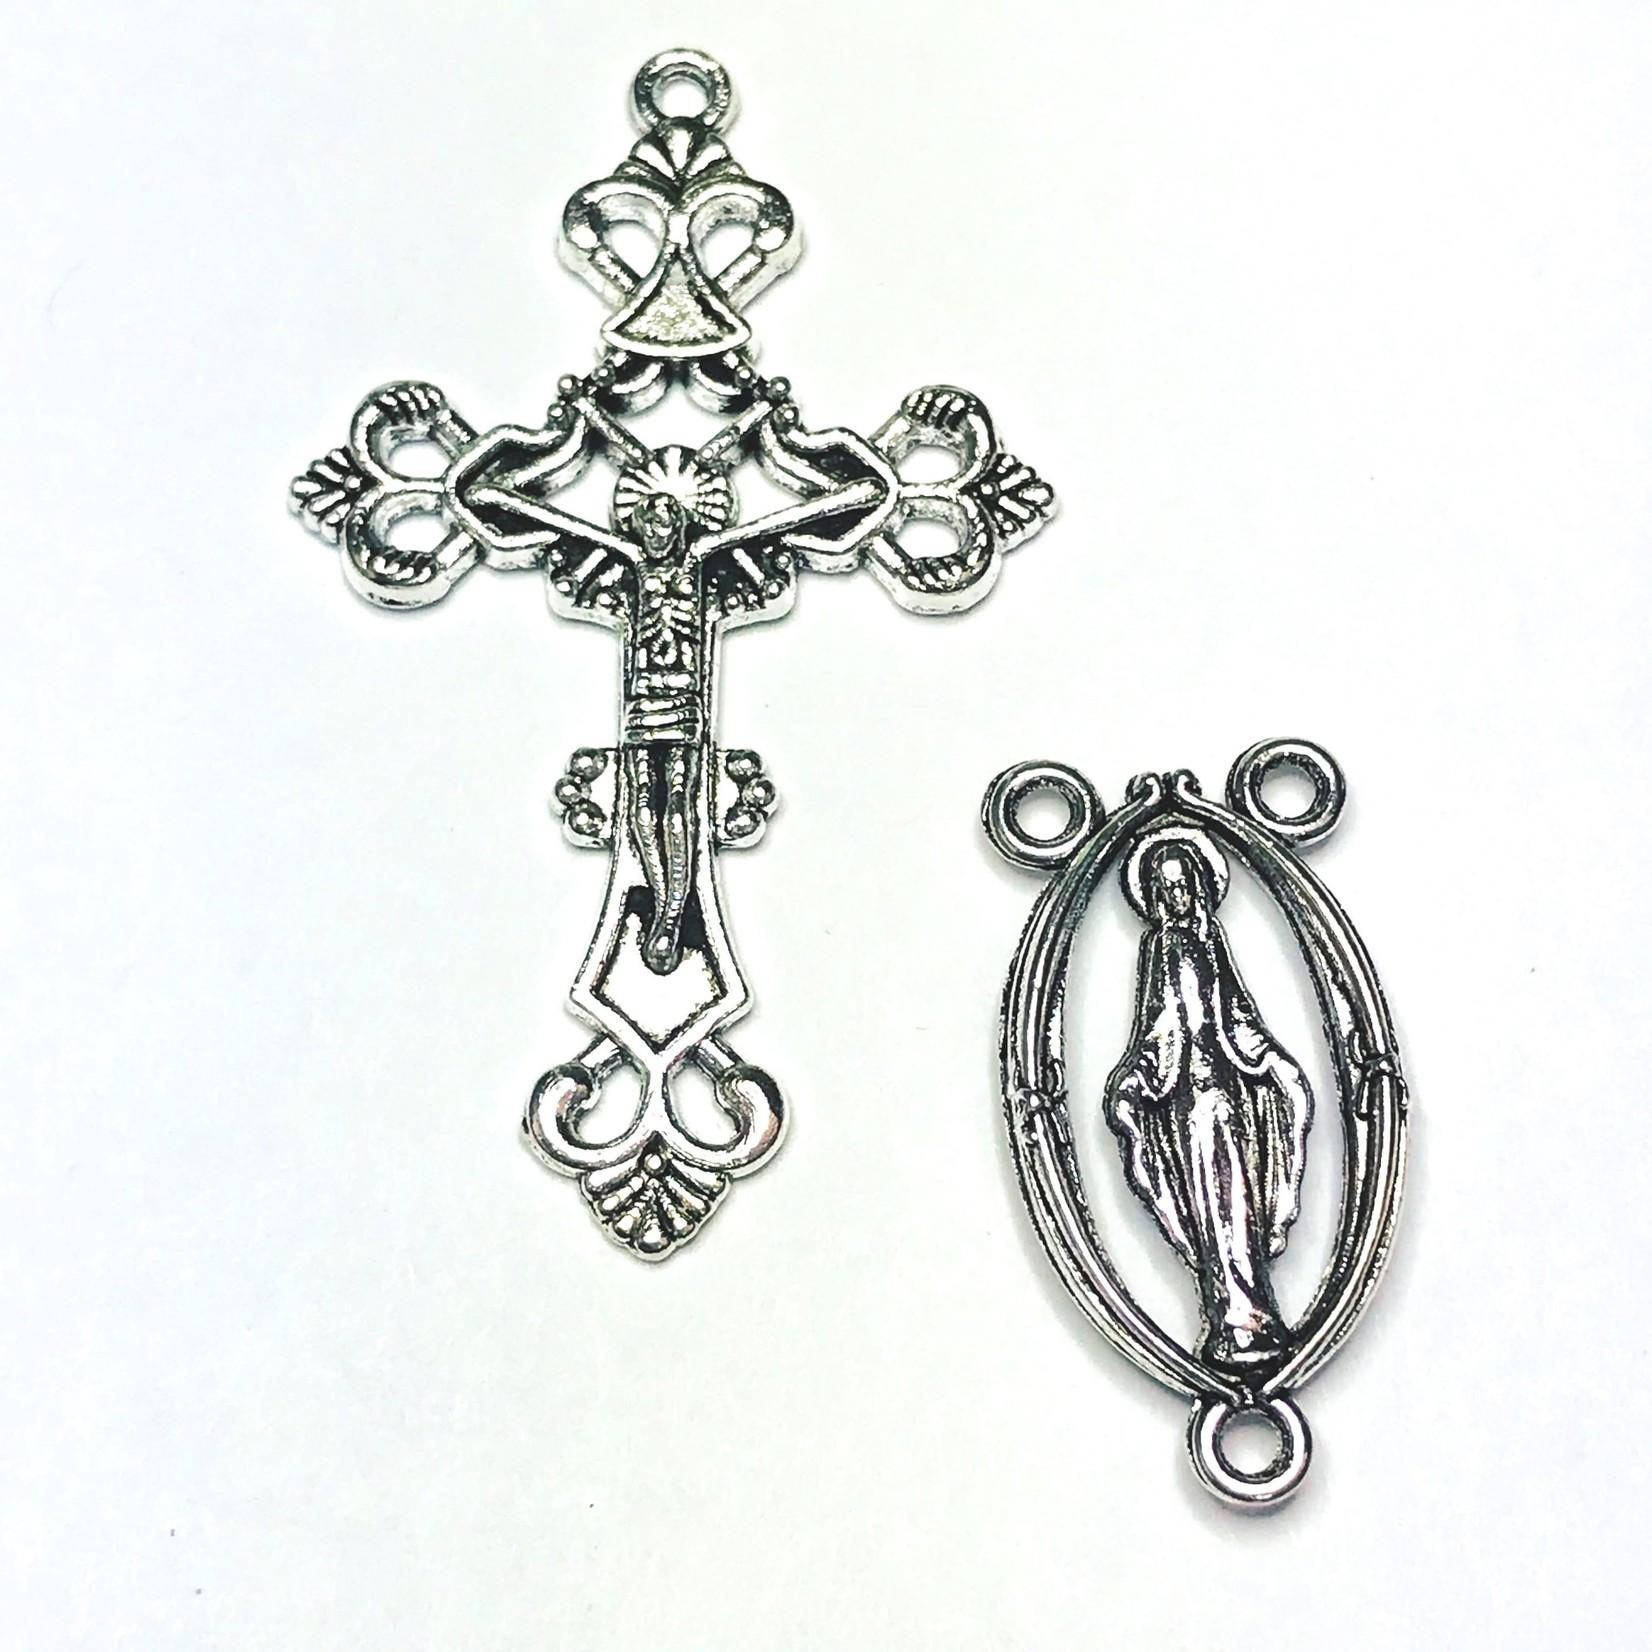 Antique Silver Rosary Cross & Centre Set 43mm